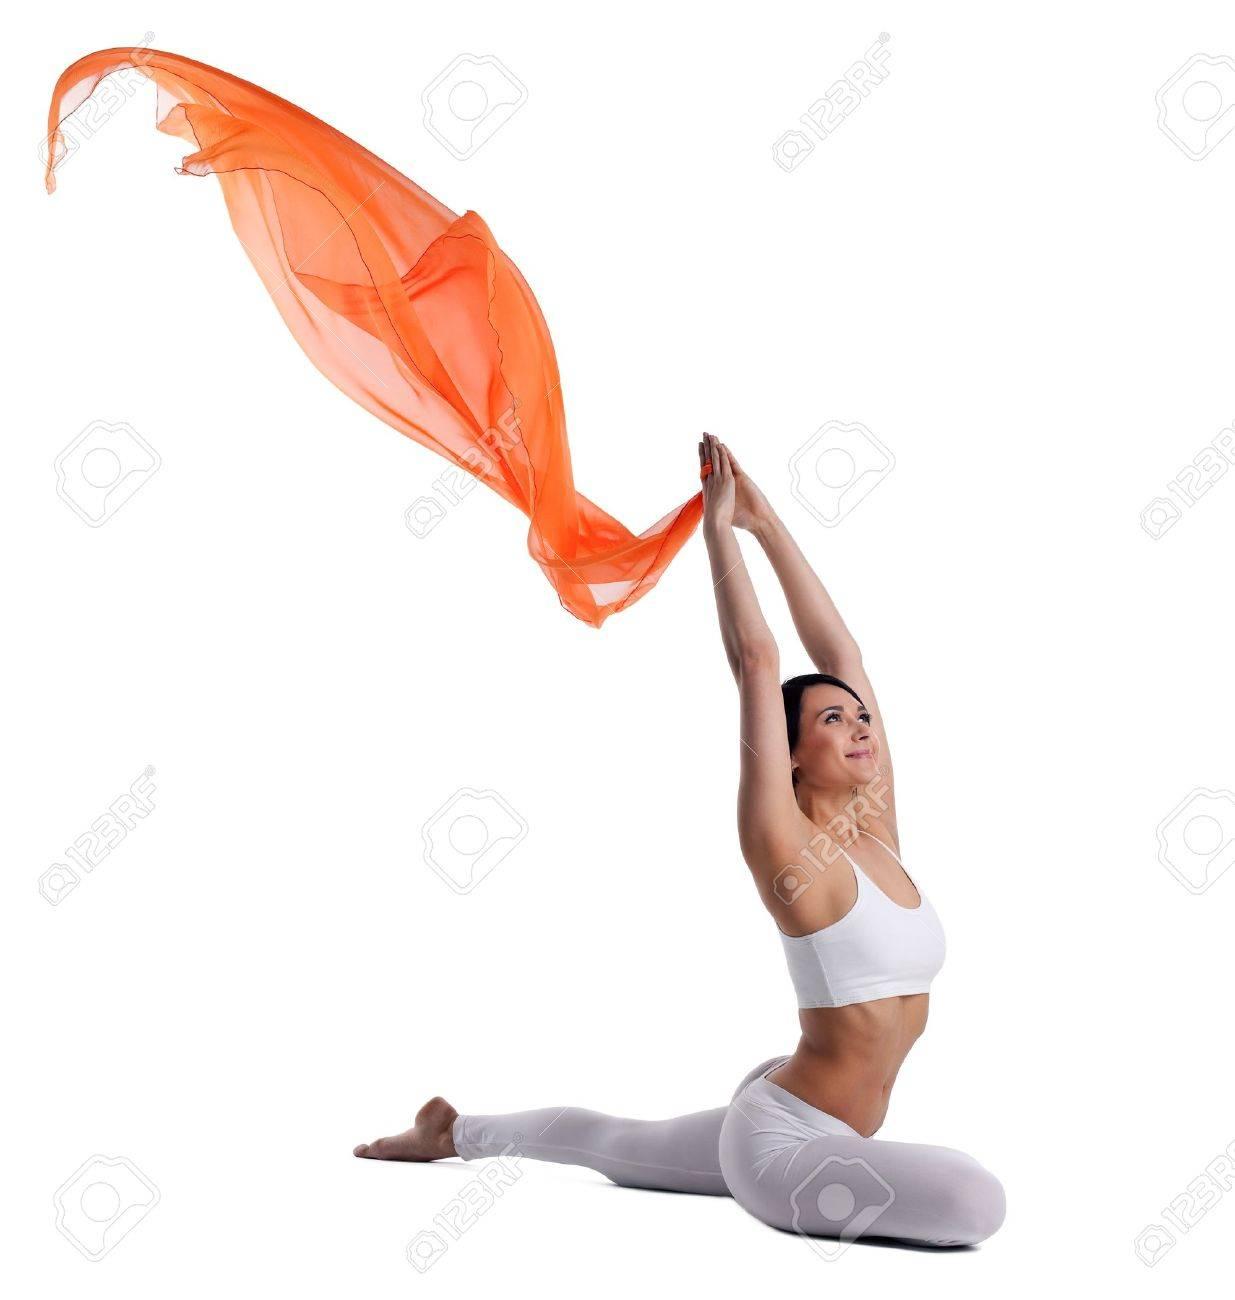 Young Beauty Woman In Yoga Asanas Und Orange Stoff - Taube Pose ...